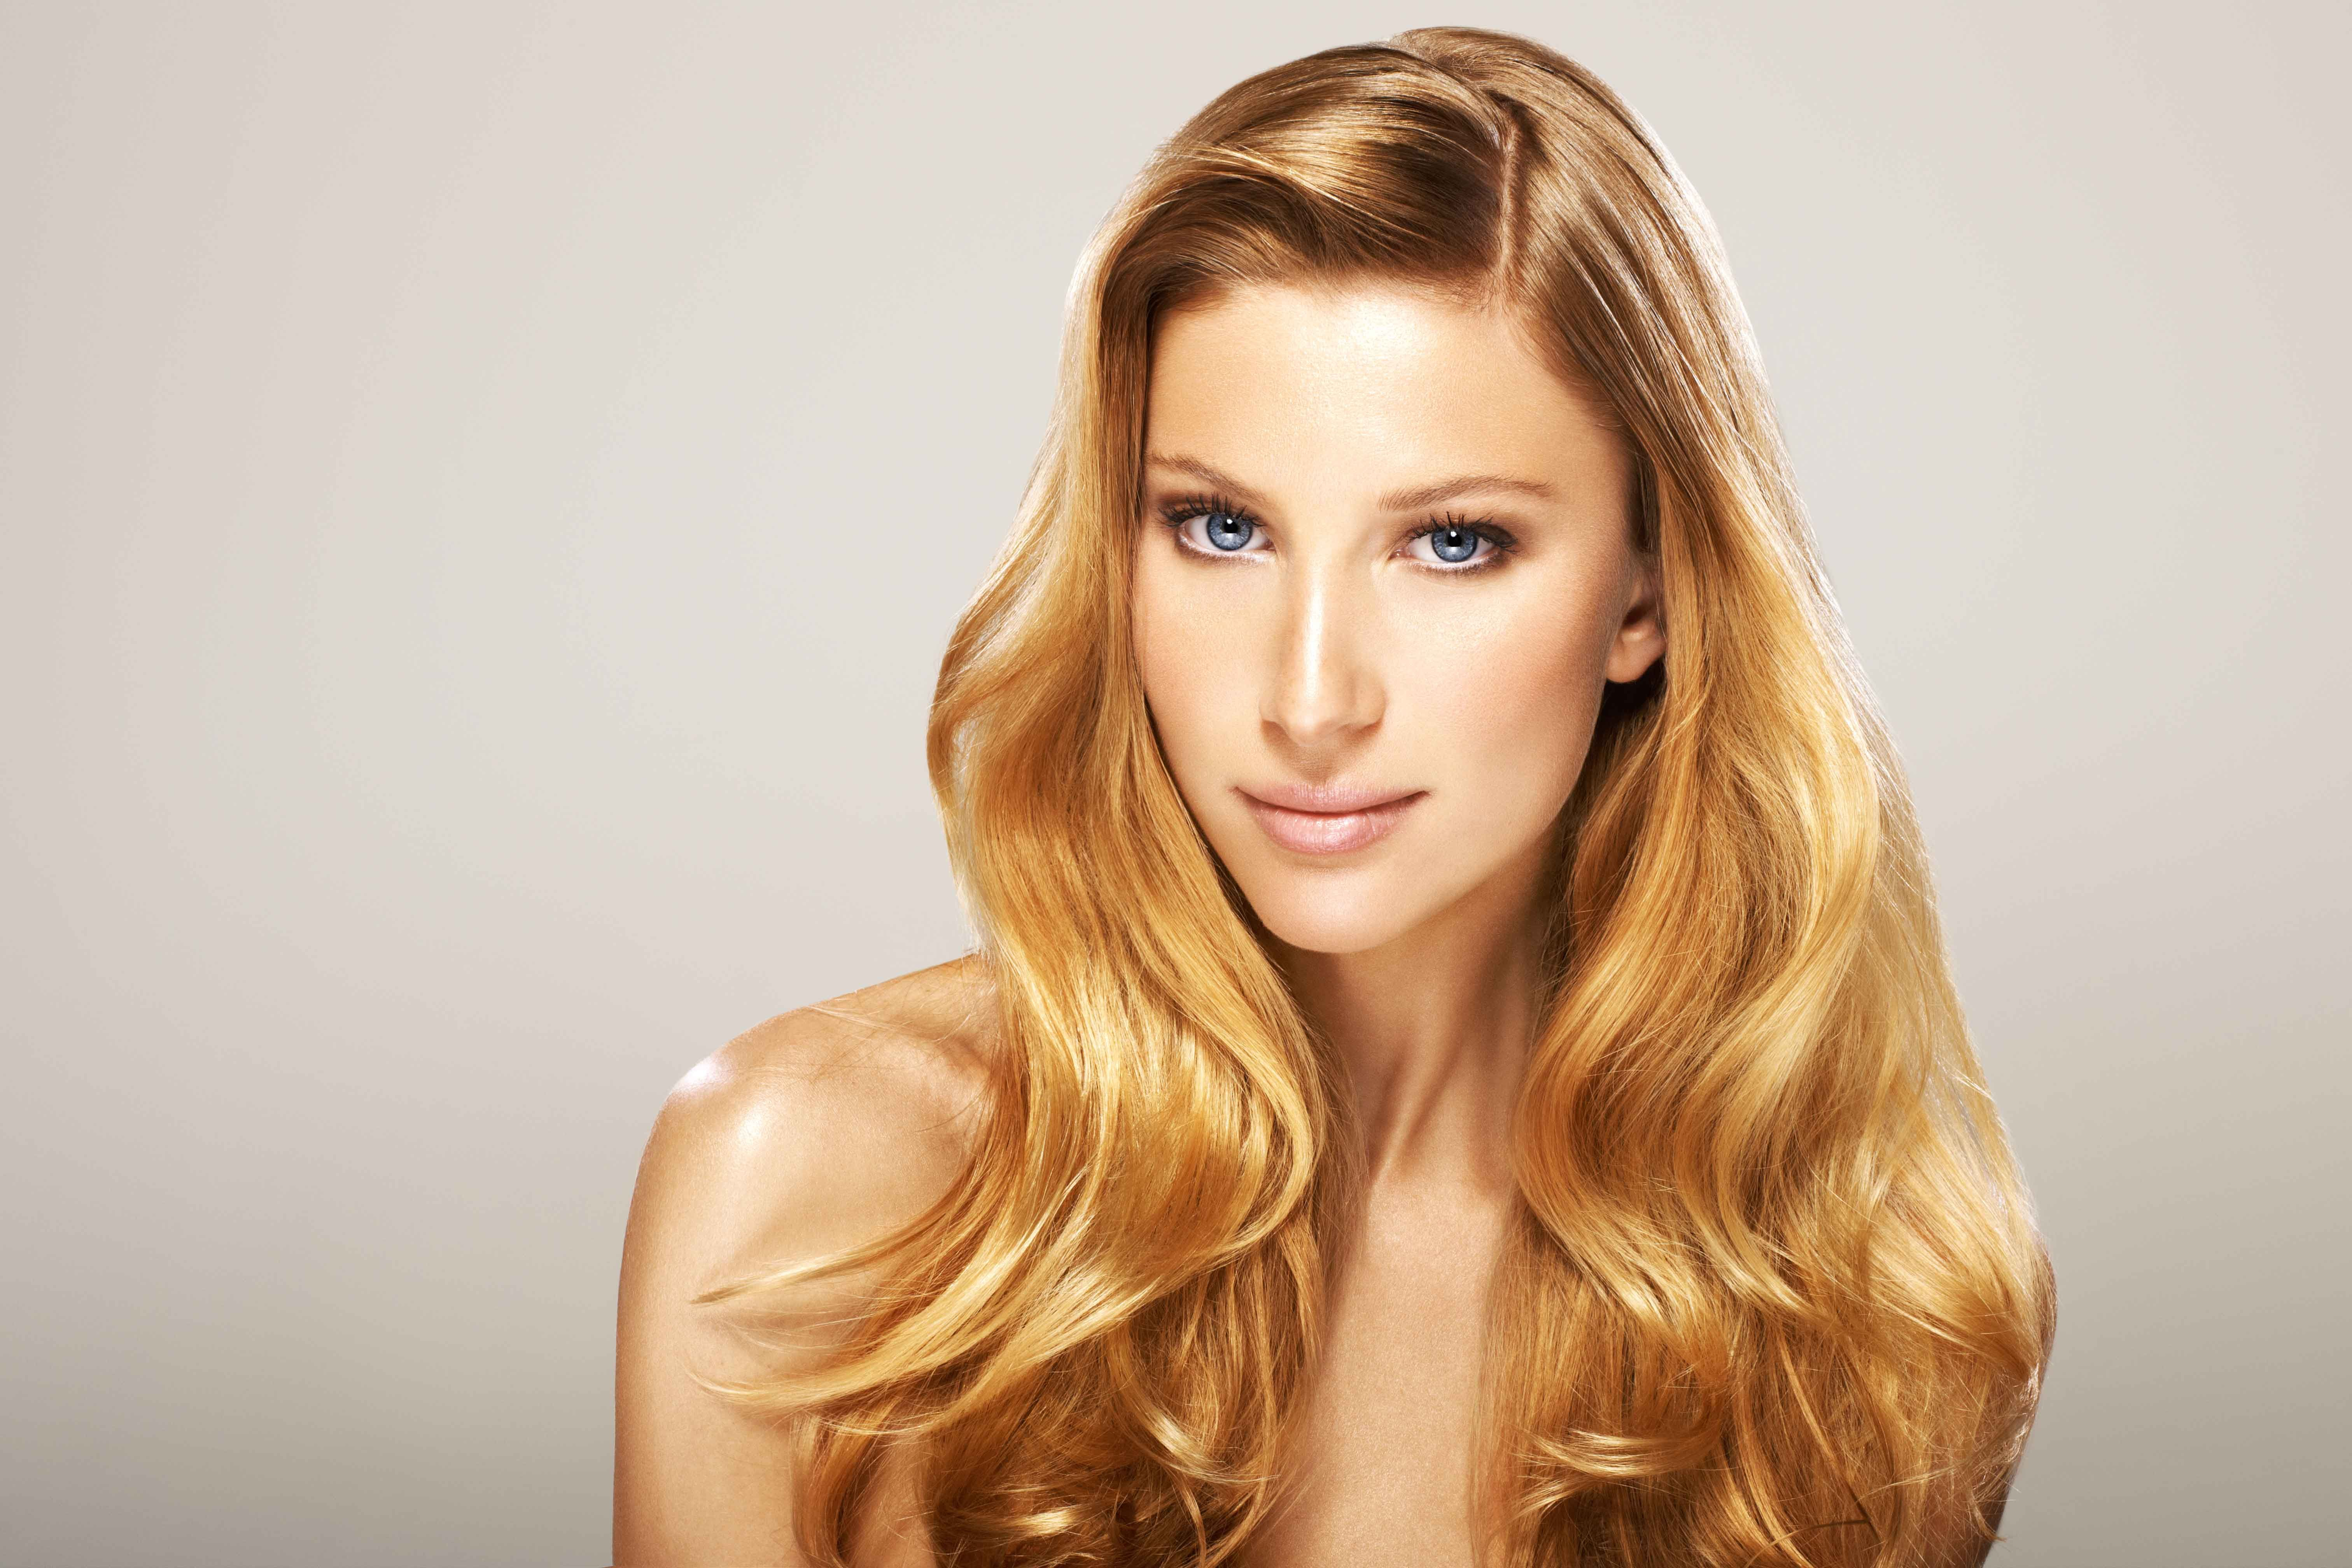 Framesi Hair Colour // Available at Dandelion Salon, Nashville TN #Framesi #HairColour #Blonde #Highlighting #DandyHair #Nashville